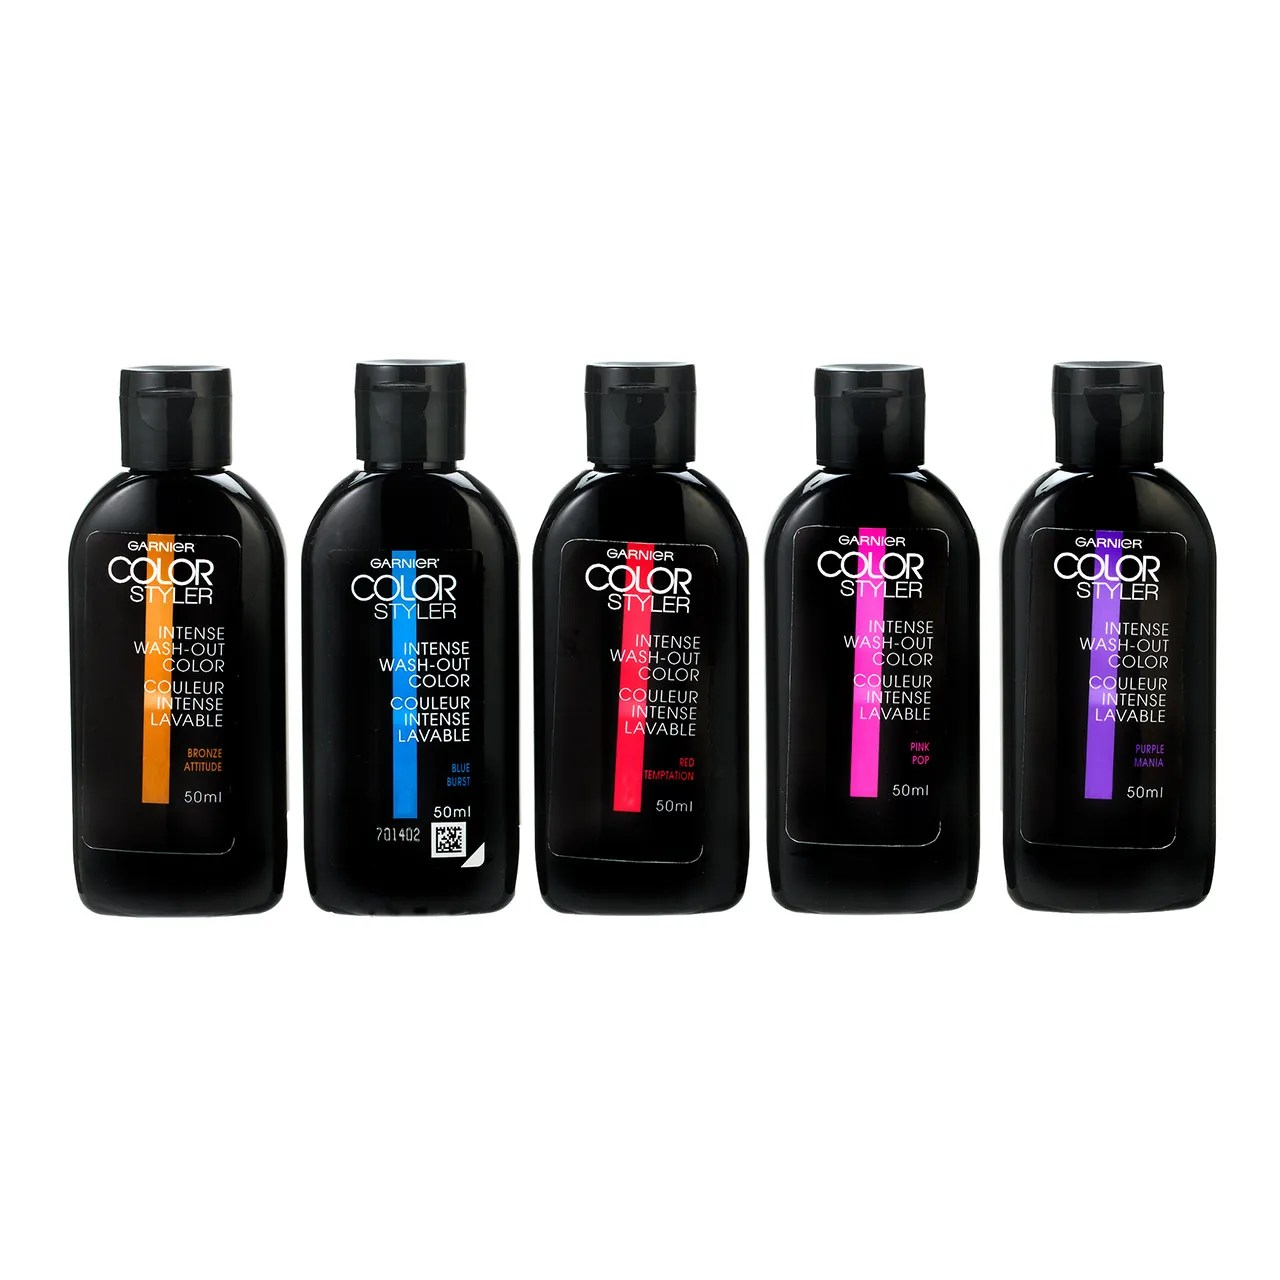 Garnier Color Styler Intense Washout Color Review  Allure